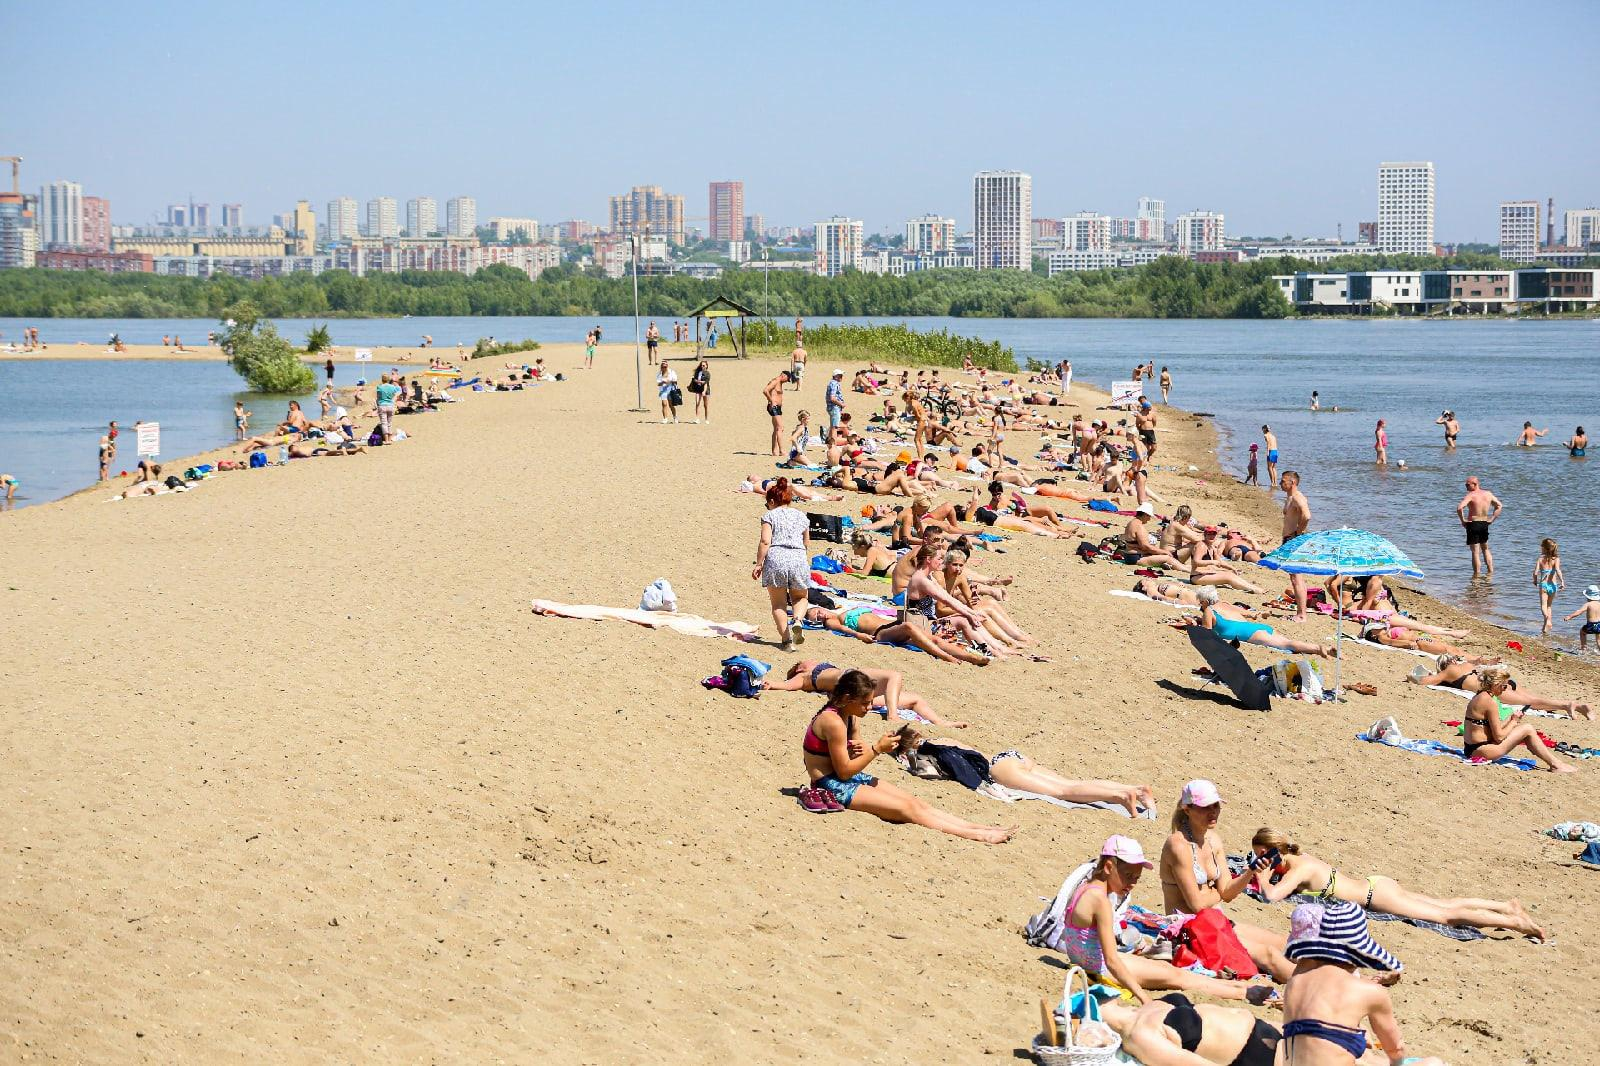 фото Бикини, селфи и горячий песок: 10 жарких фото с Бугринского пляжа в Новосибирске 4